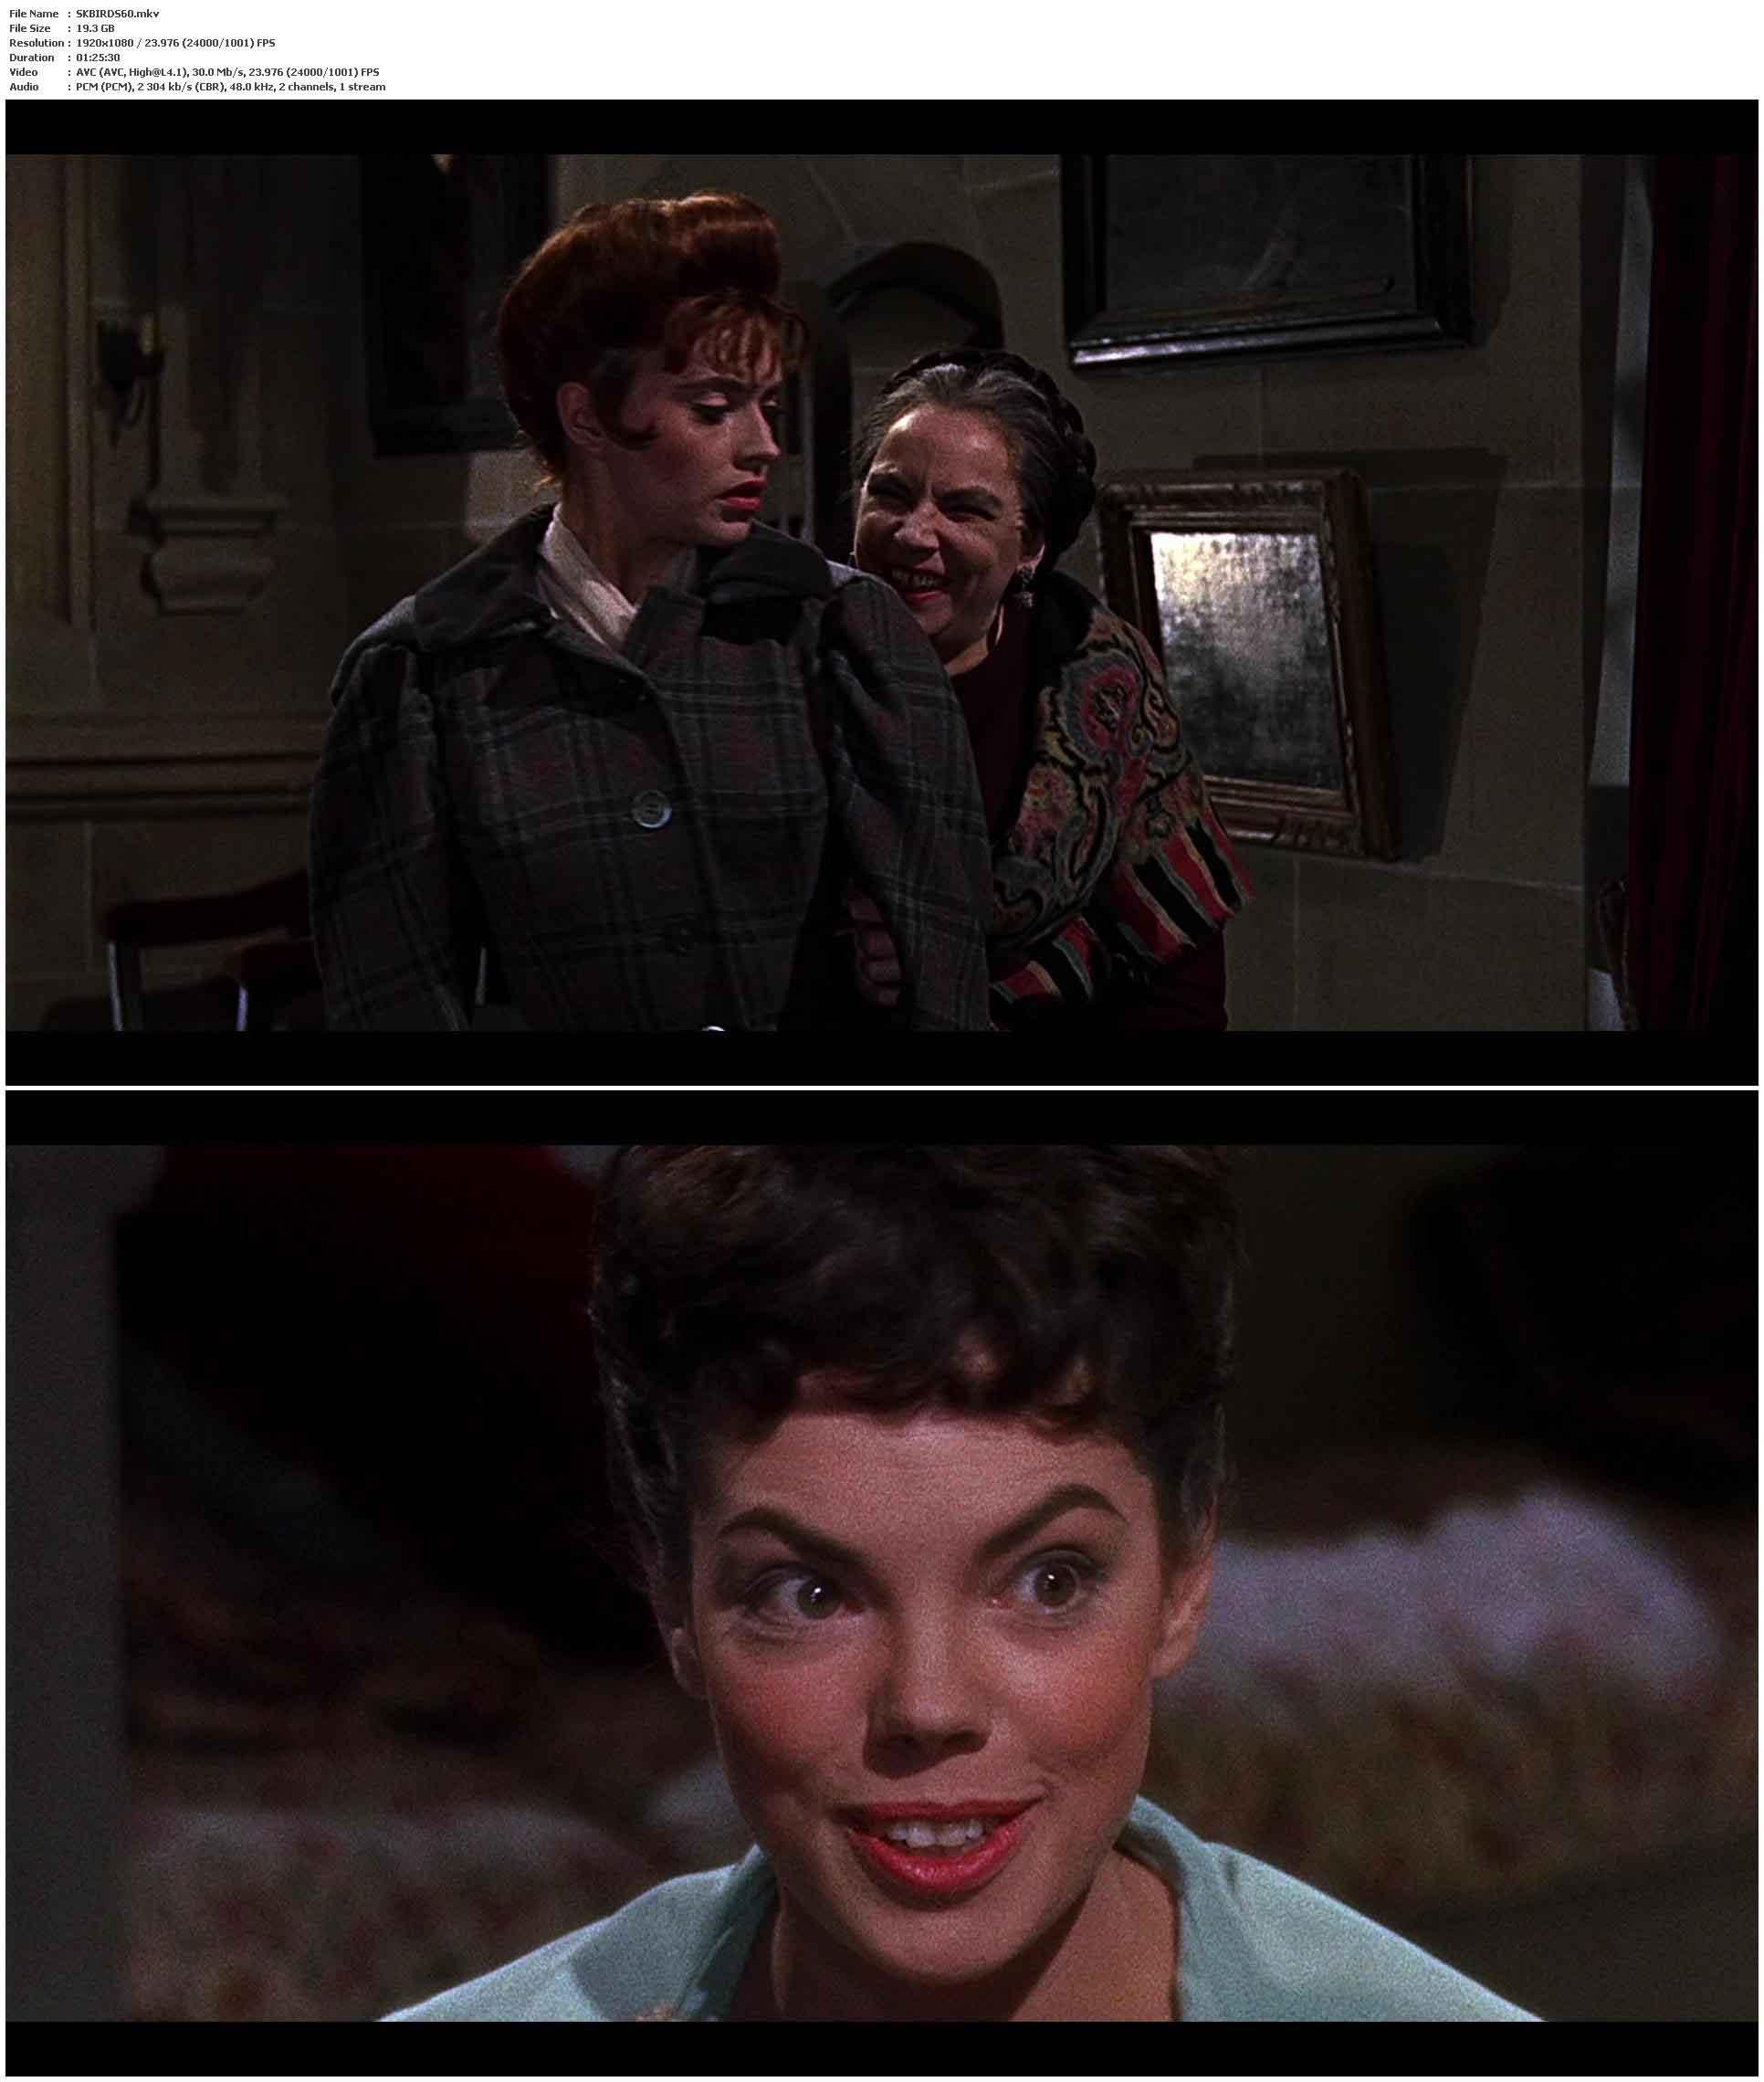 The Brides of Dracula (1960)